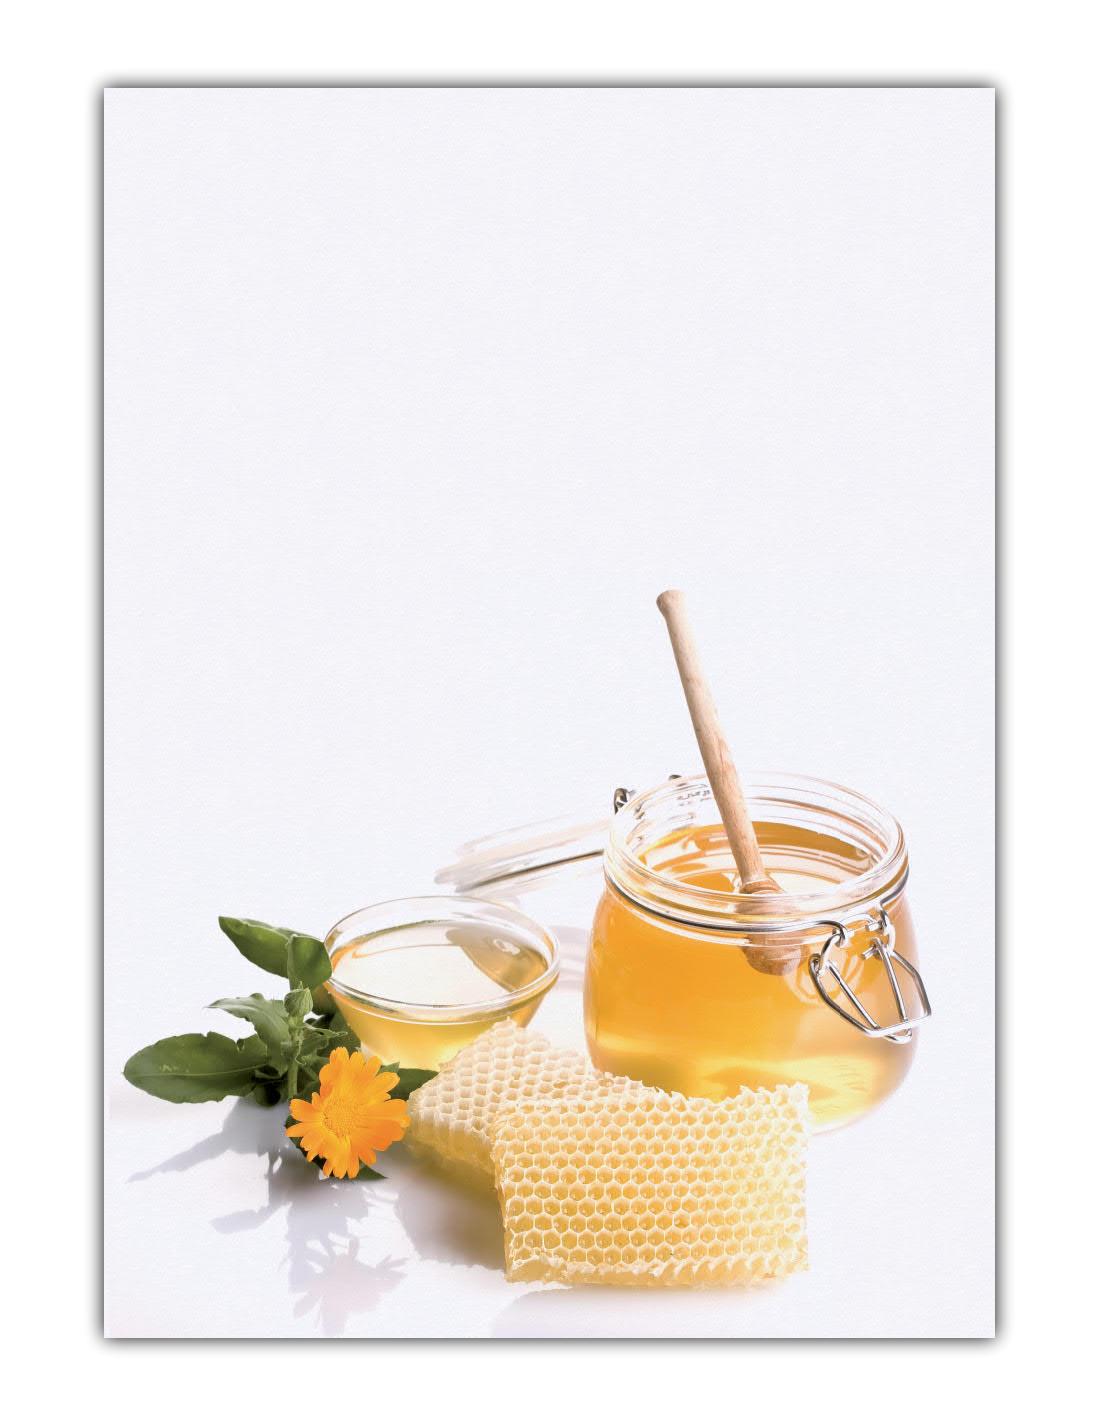 Honig Motivpapier Briefpapier (MPA-5206, DIN A4, 100 Blatt) Bienen Imker Ringelblumen